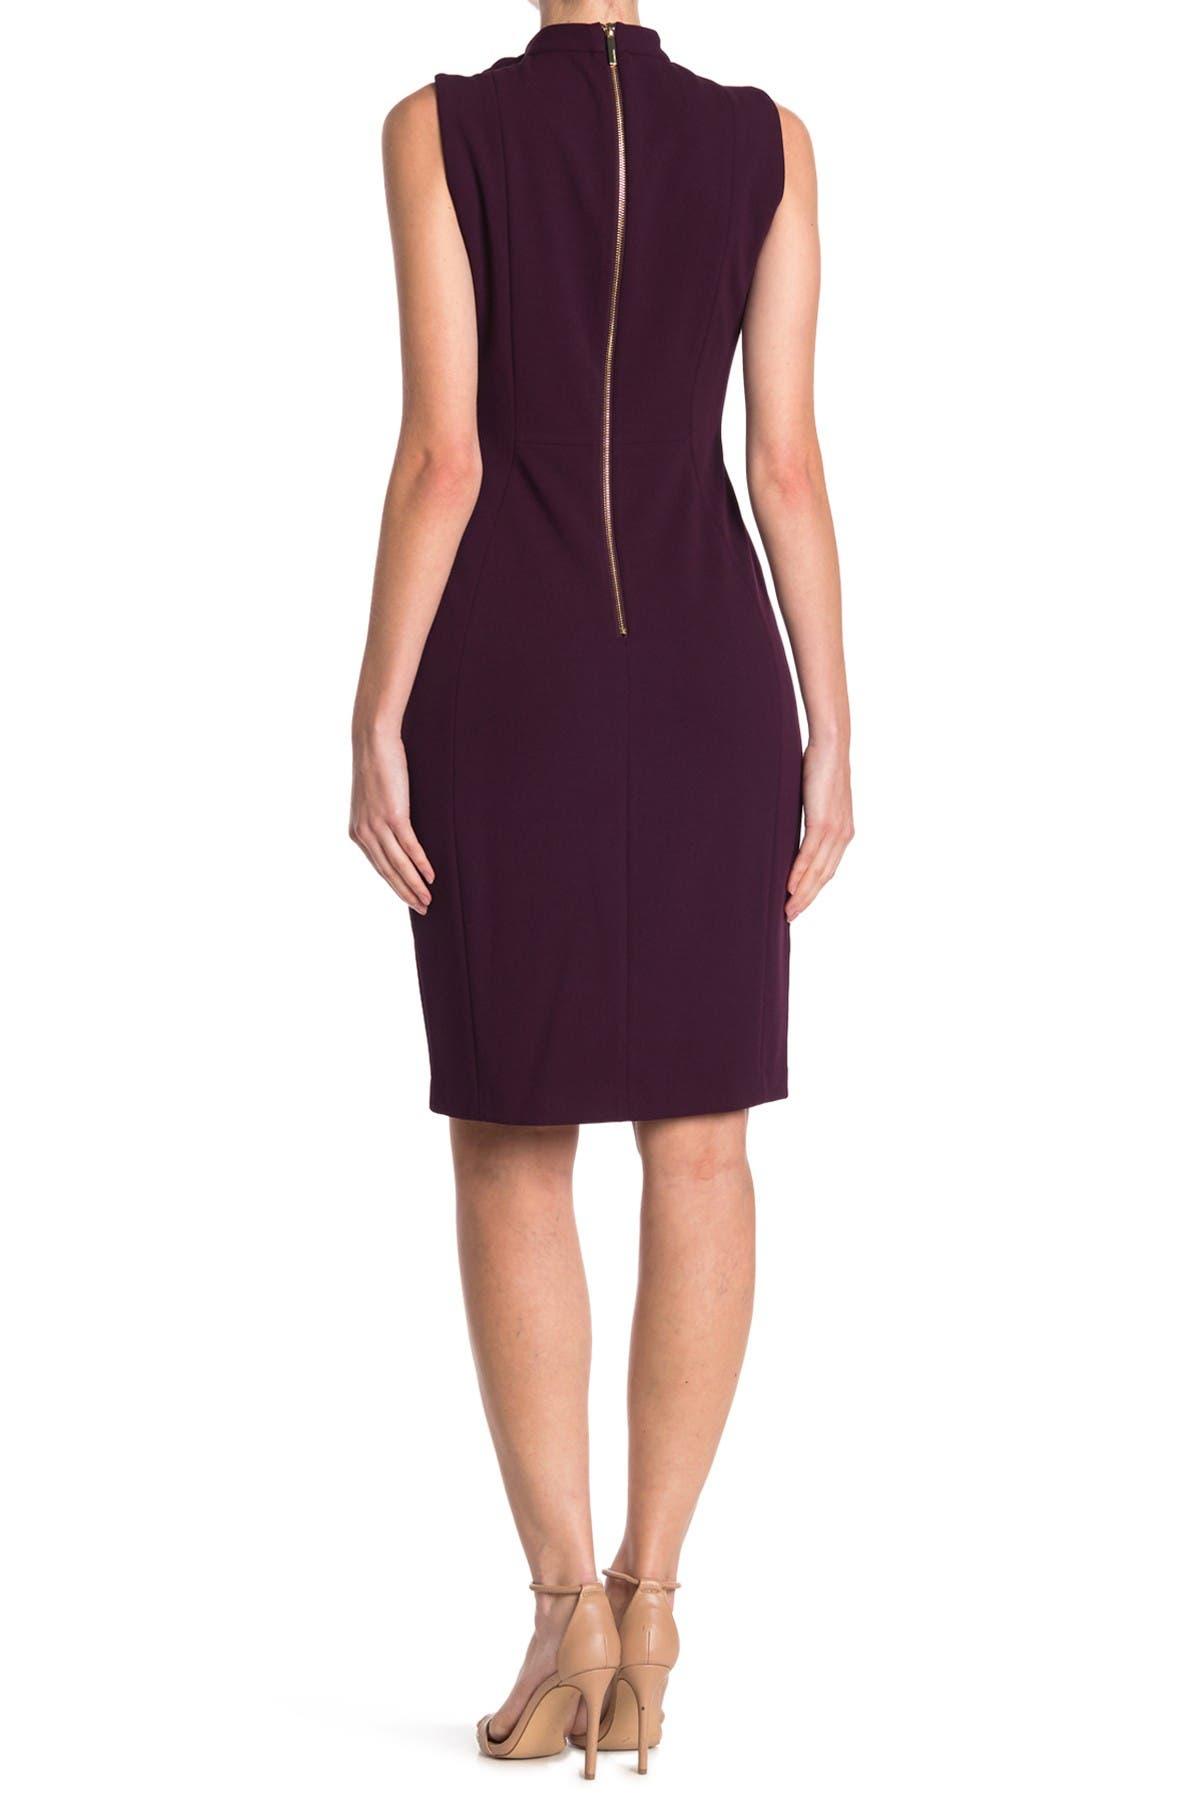 Image of Calvin Klein Sleeveless Tie Neck Sheath Dress